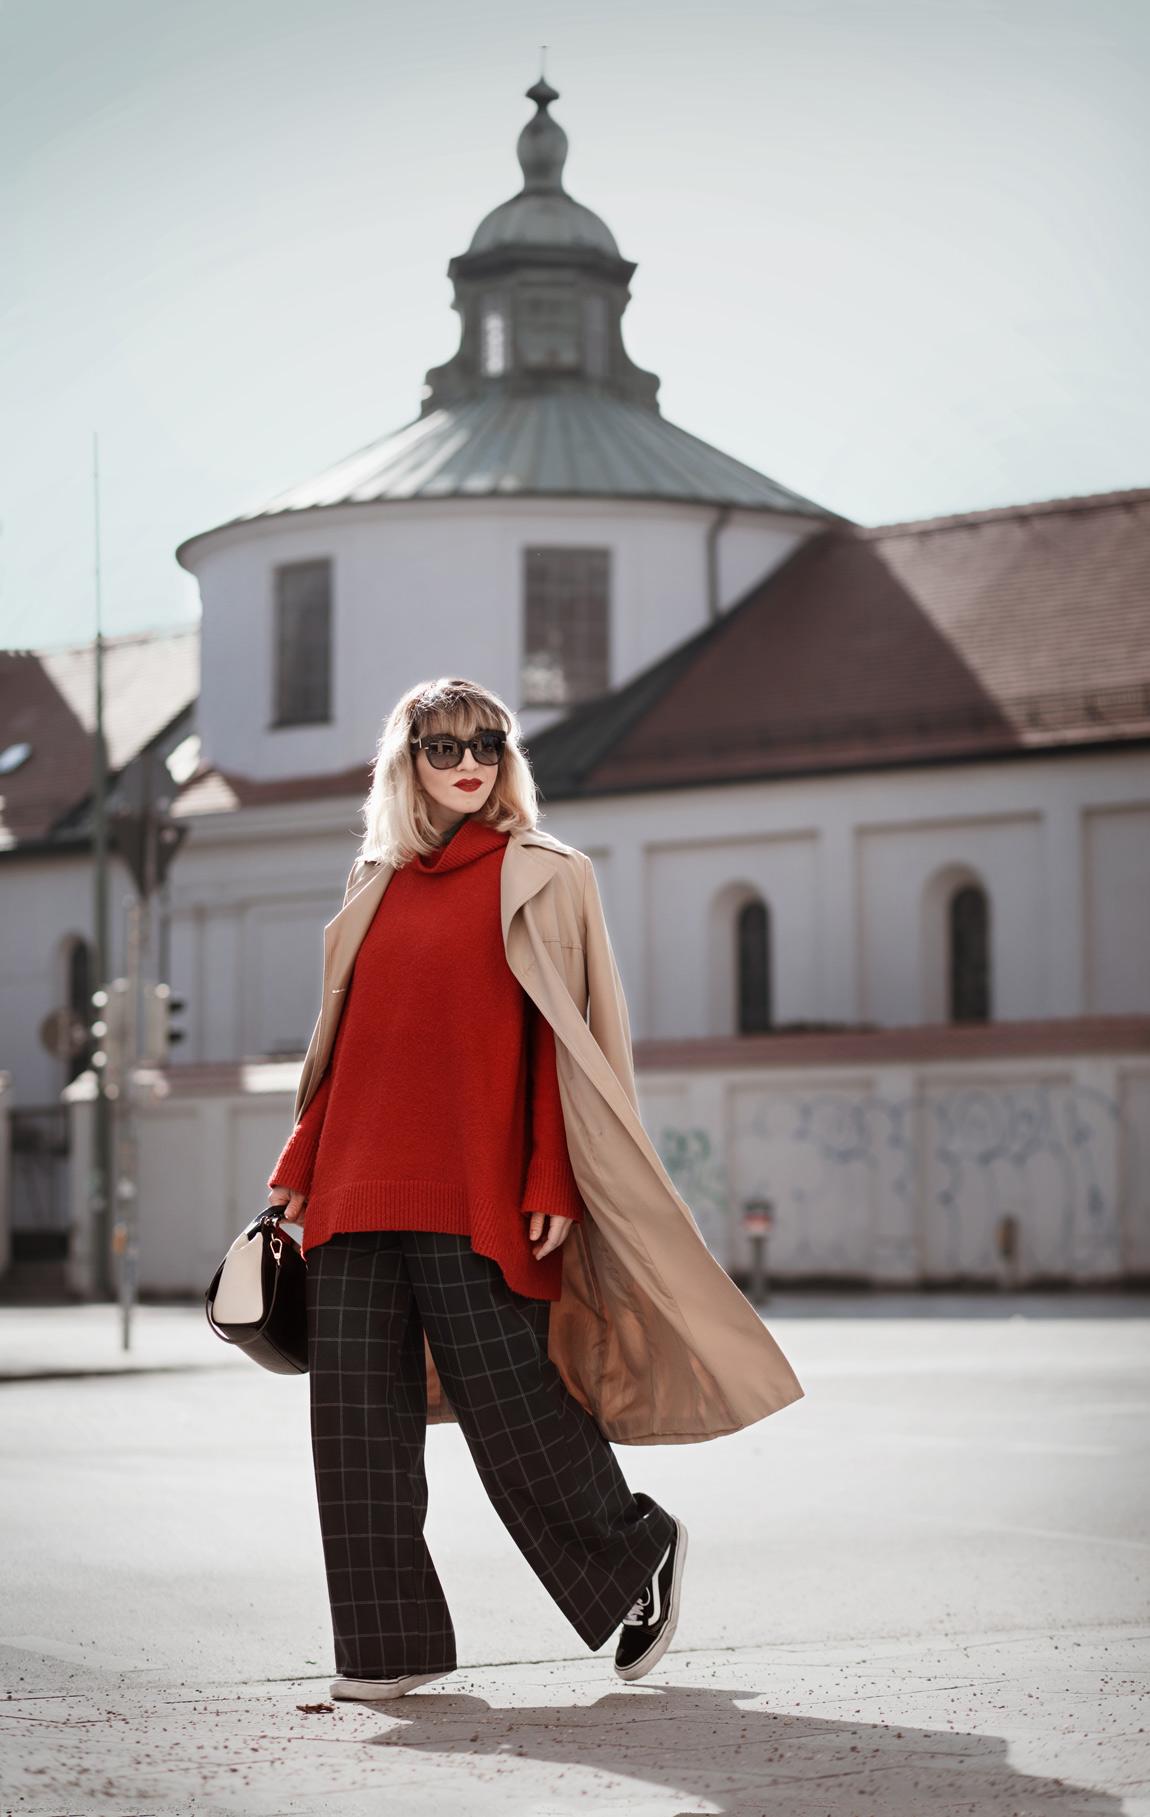 sich, durchsetzen, look, blogger, fashionblog, modeblogger, berlin, muenchen, rot, outfit, waschsalon, cute, suess, streetstyle, oversize